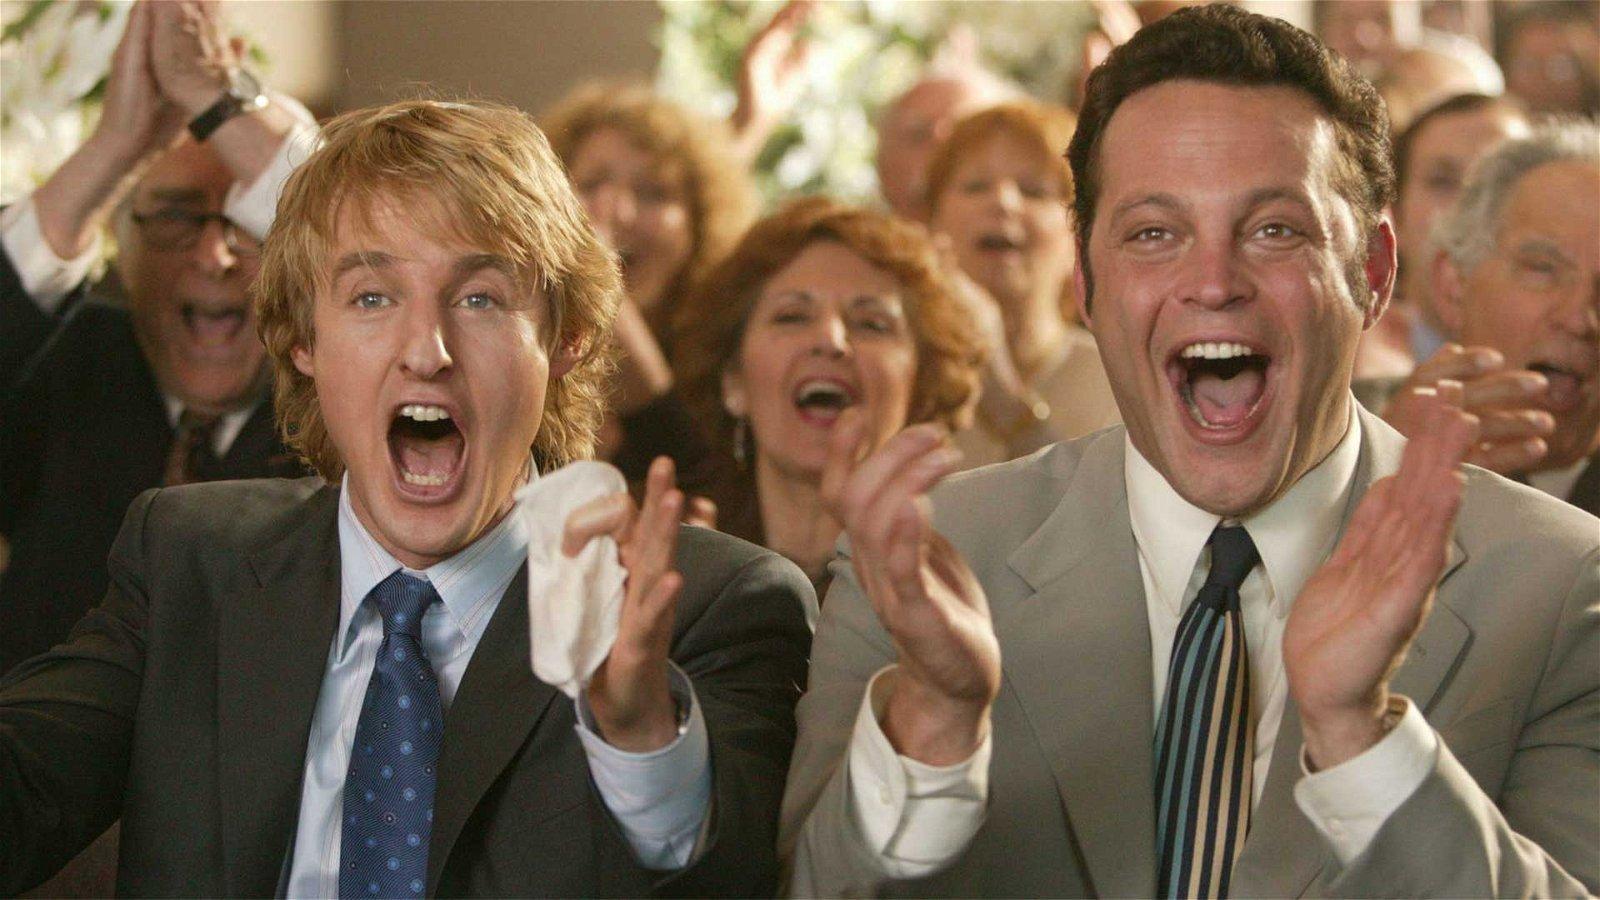 Vince Vaughn Confirms Wedding Crashers Sequel